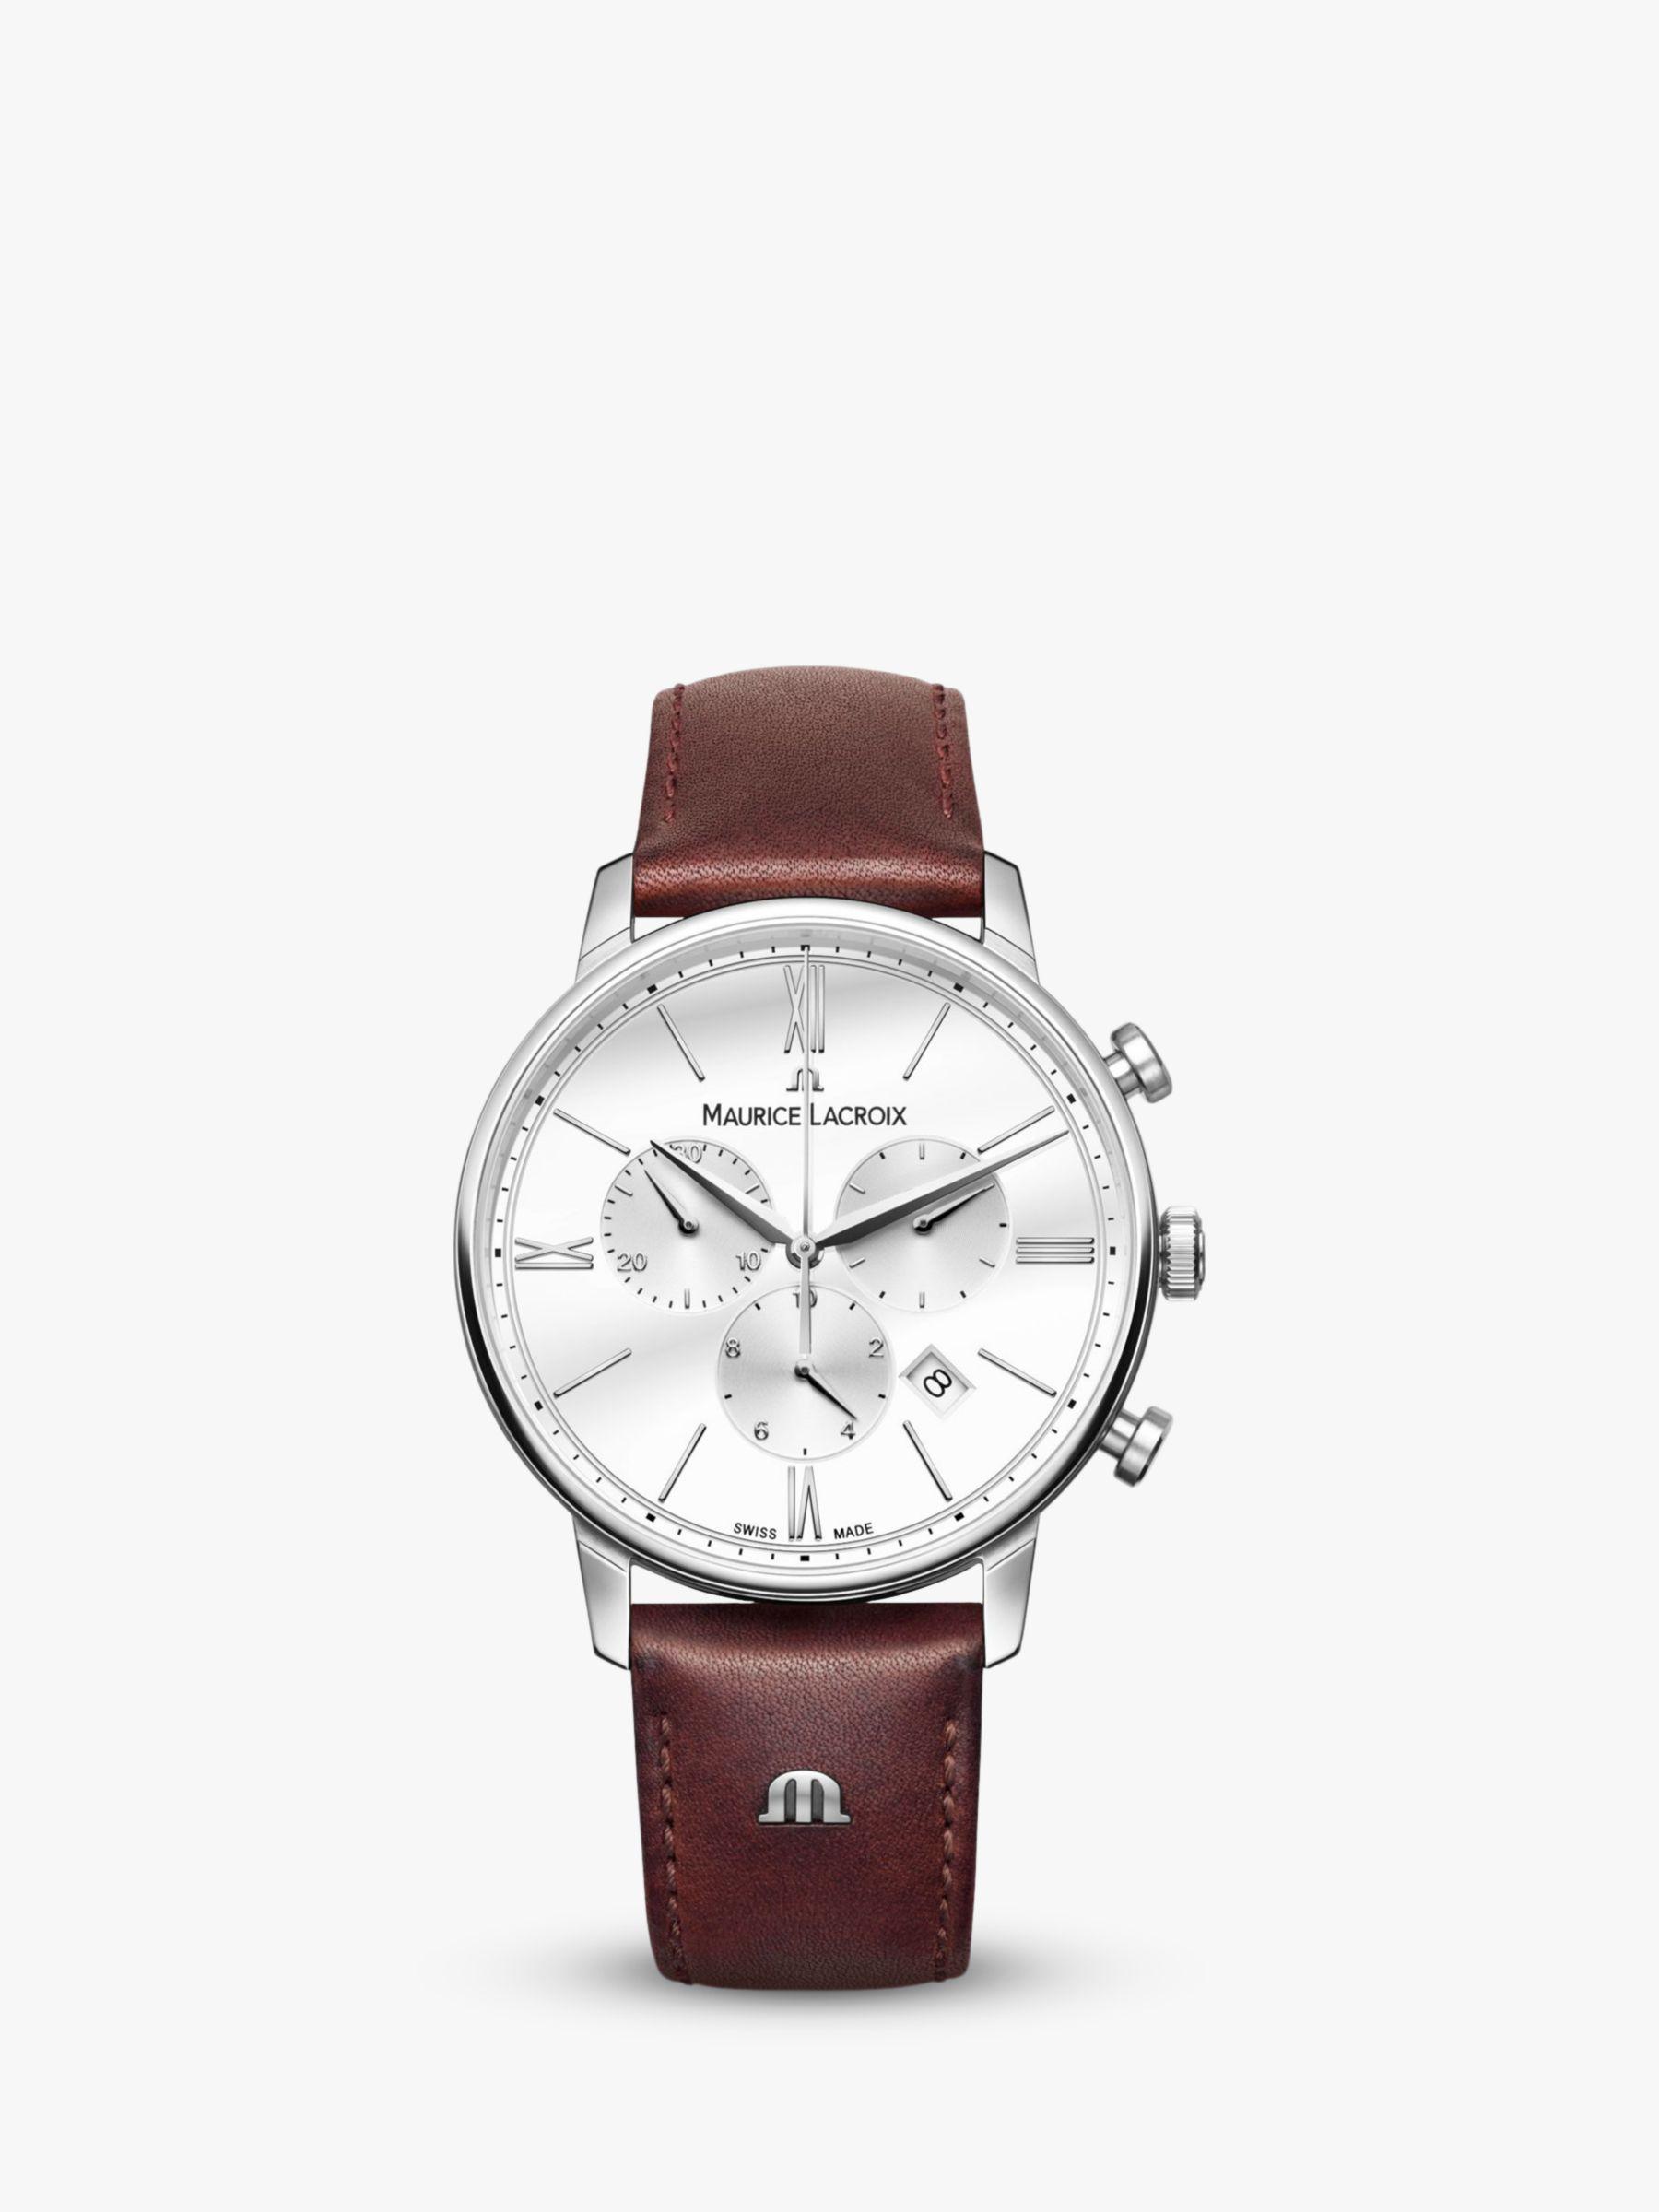 Maurice Lacroix Maurice Lacroix EL1098-SS001-112-1 Men's Eliros Chronograph Date Leather Strap Watch, Dark Brown/White